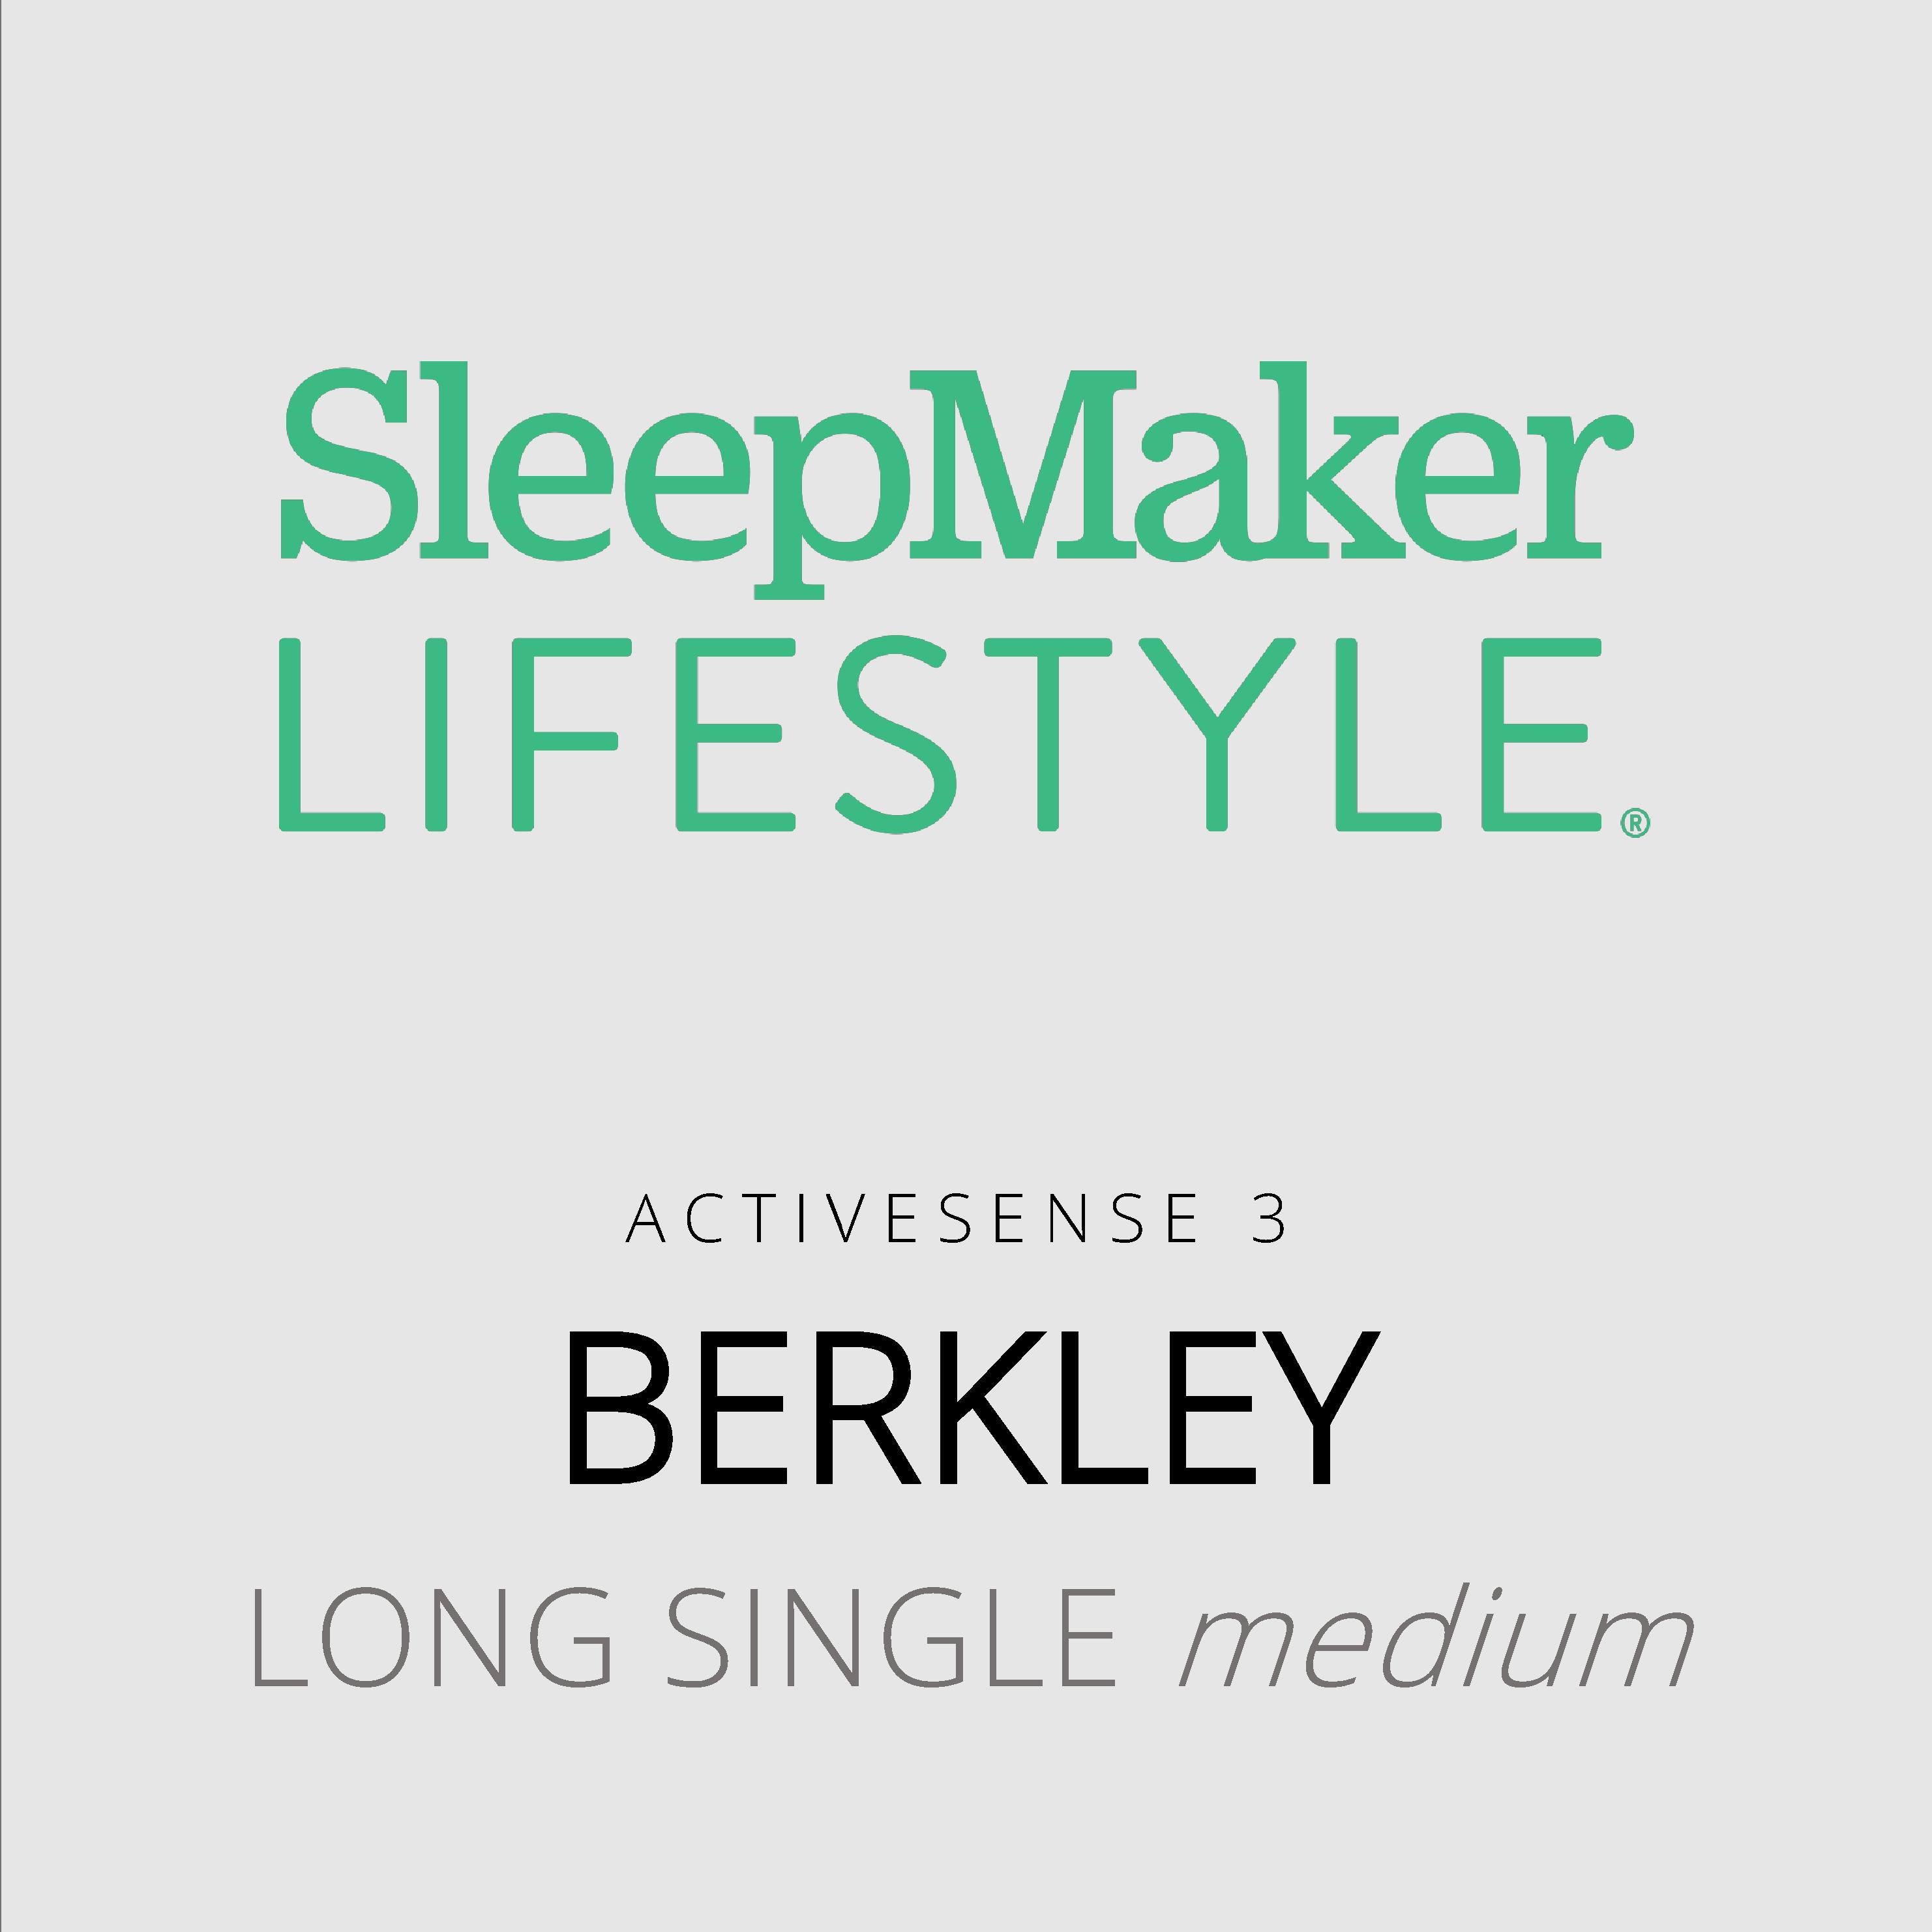 SleepMaker Lifestyle – Berkley – ActiveSense 3 – Long Single Medium Mattress